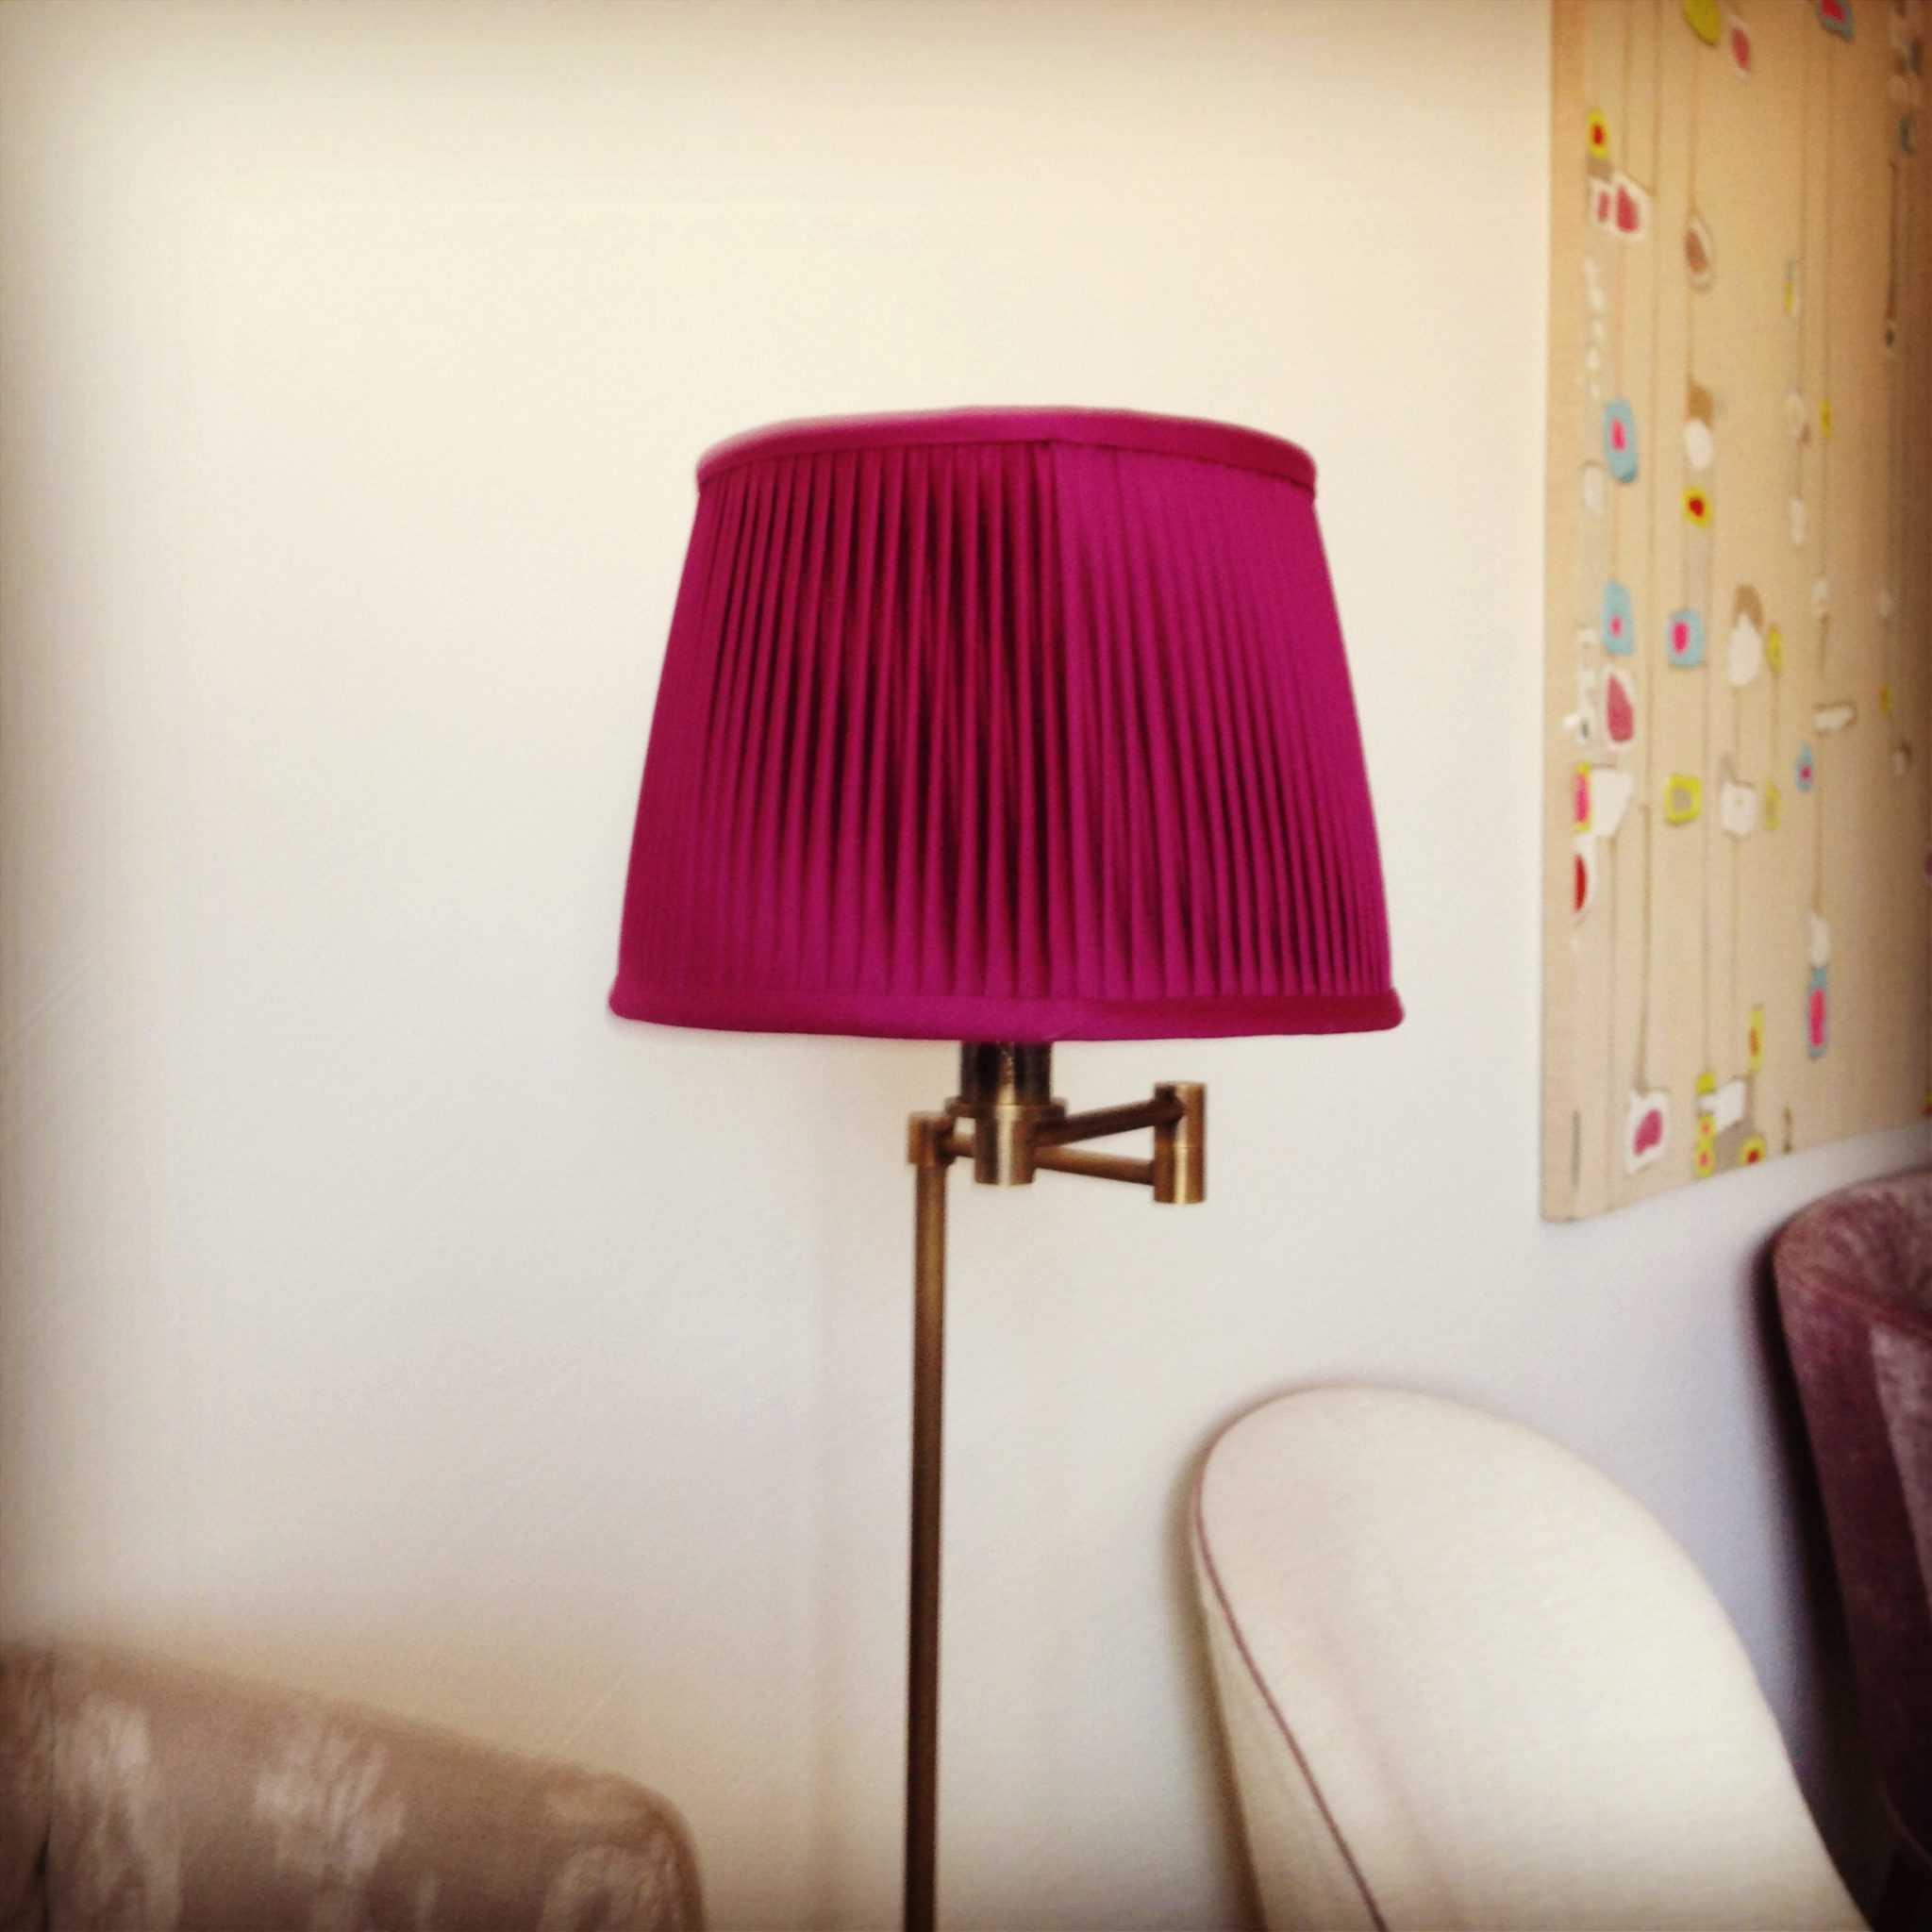 custom-red-lampshade